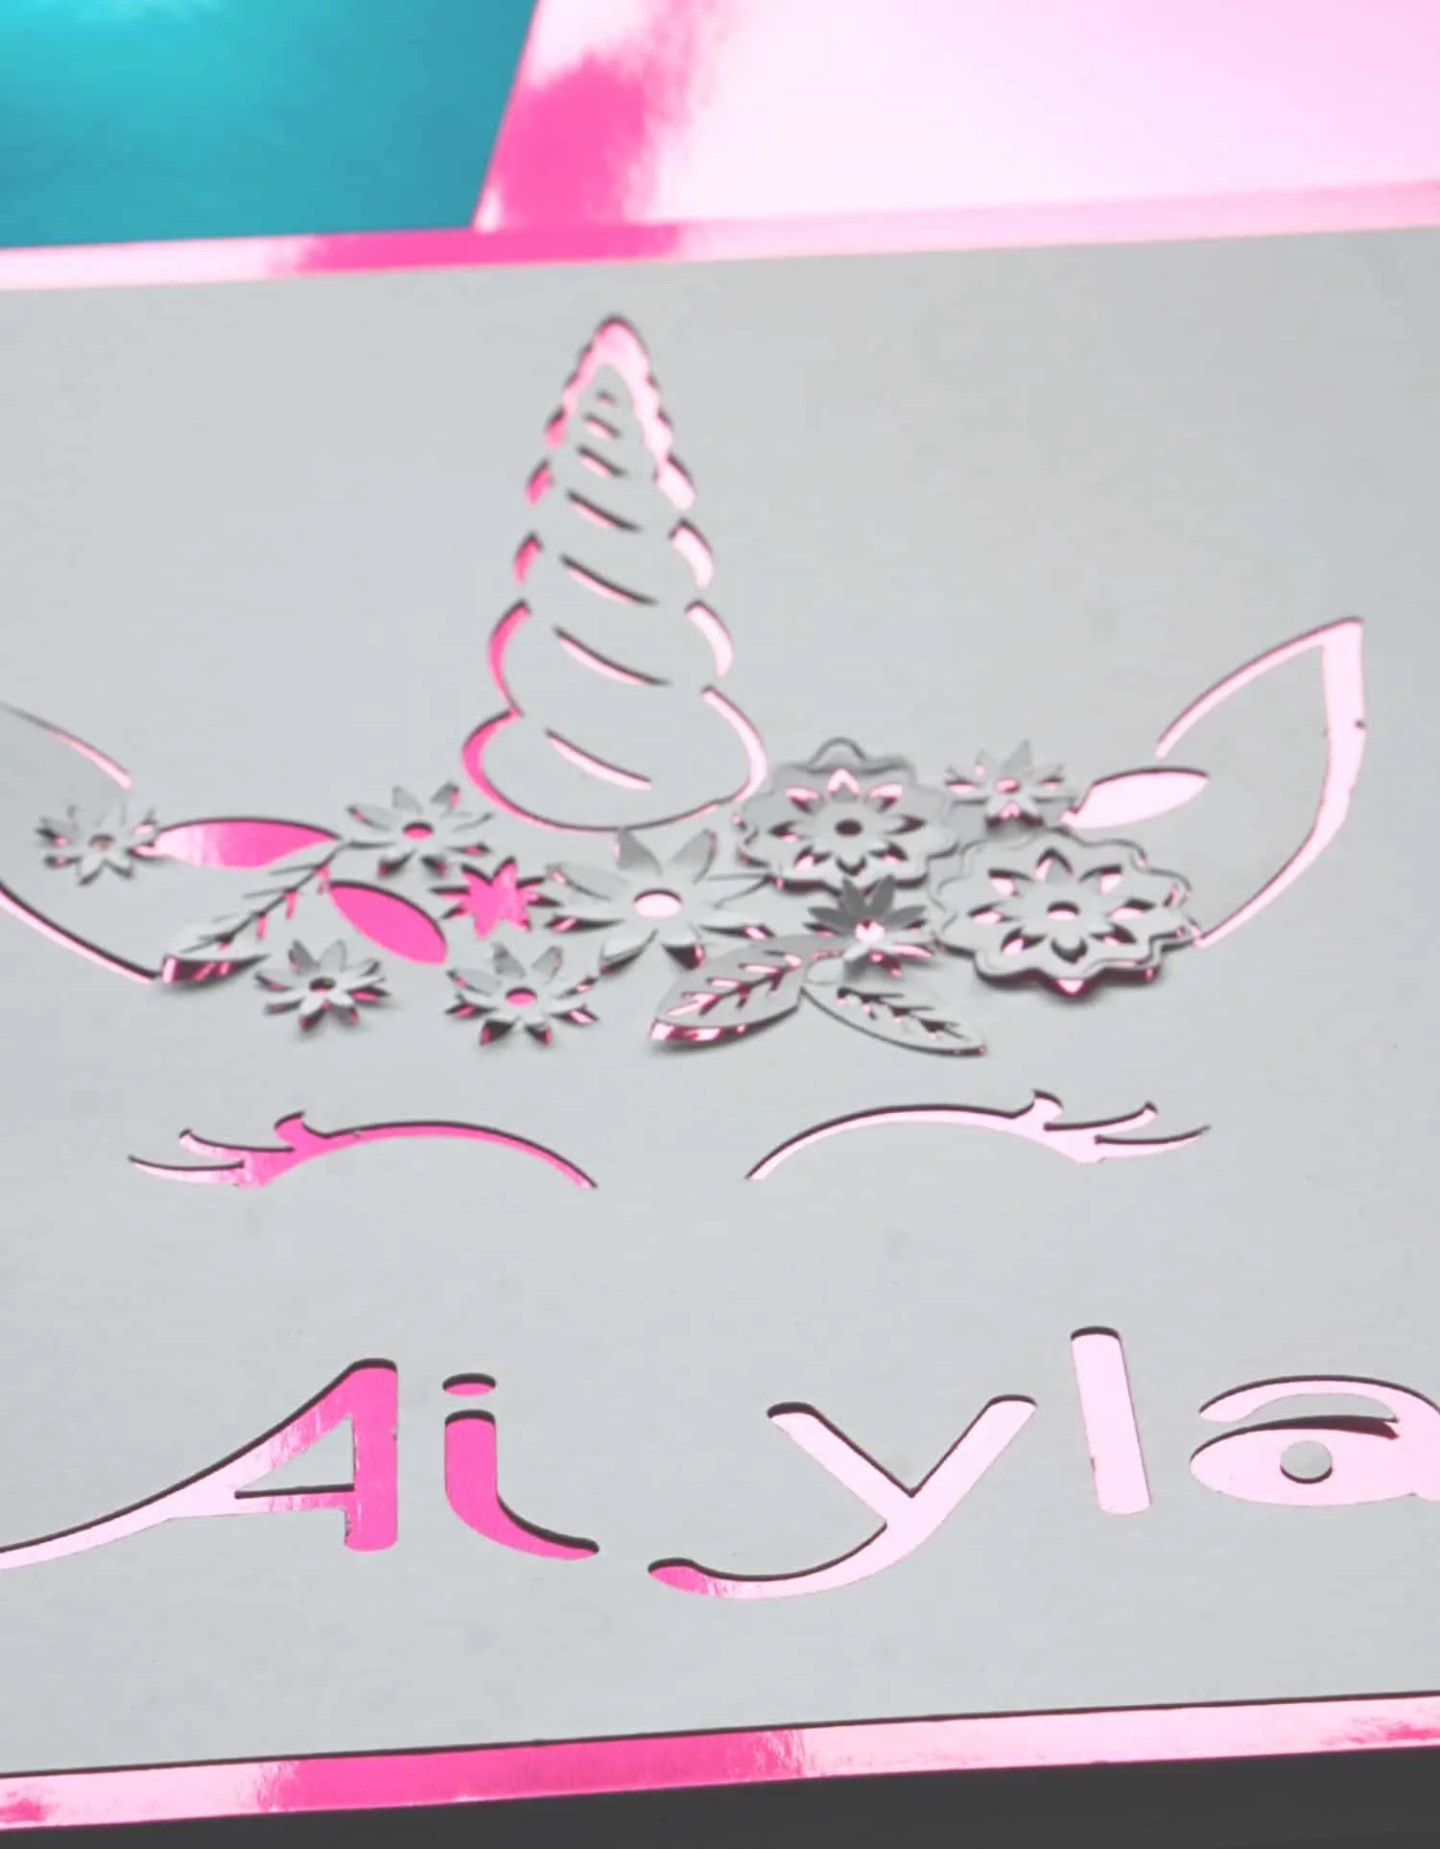 Tutorial for a Unicorn Paper Cut With The Cricut Machine www.extraordinarychaos.com